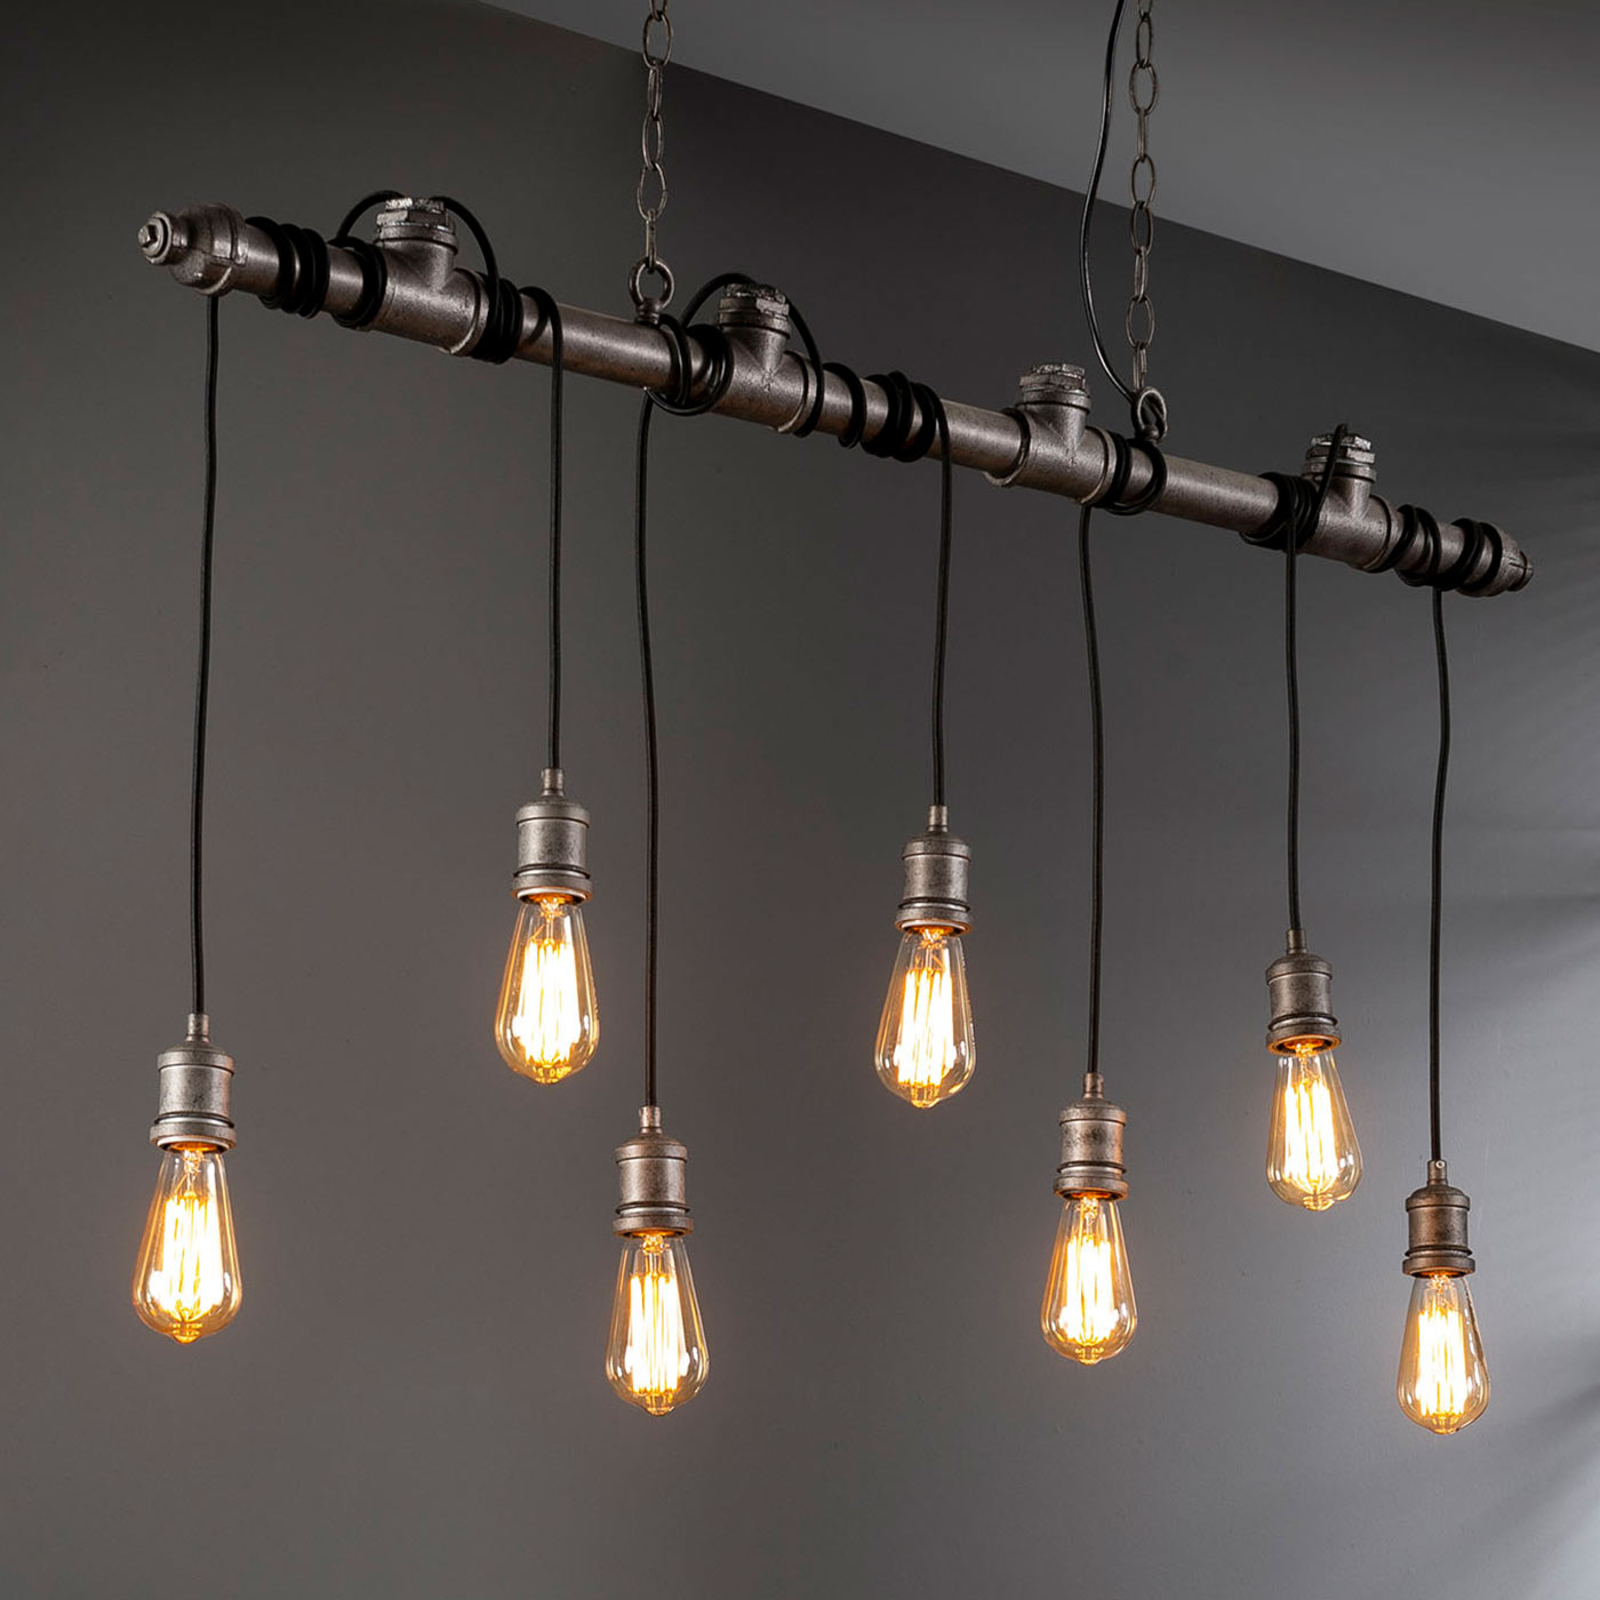 Lampa wisząca Plumblight, 7-punktowa